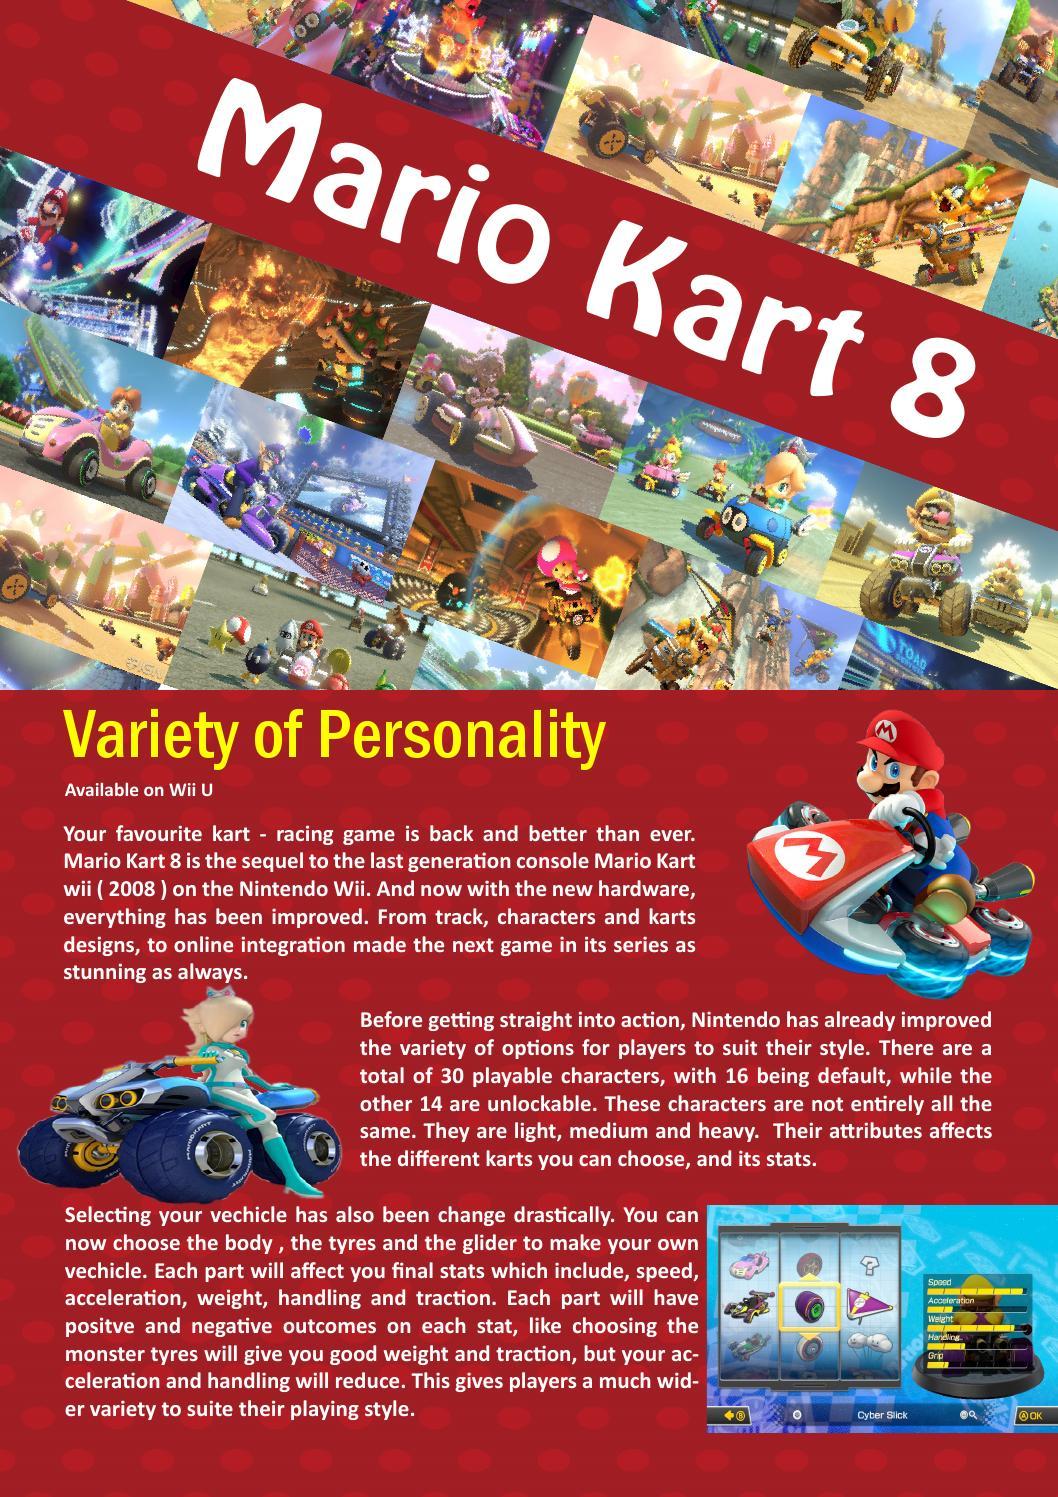 Mario Kart 8 Prototype Example Pdf Interactive By Machination Issuu